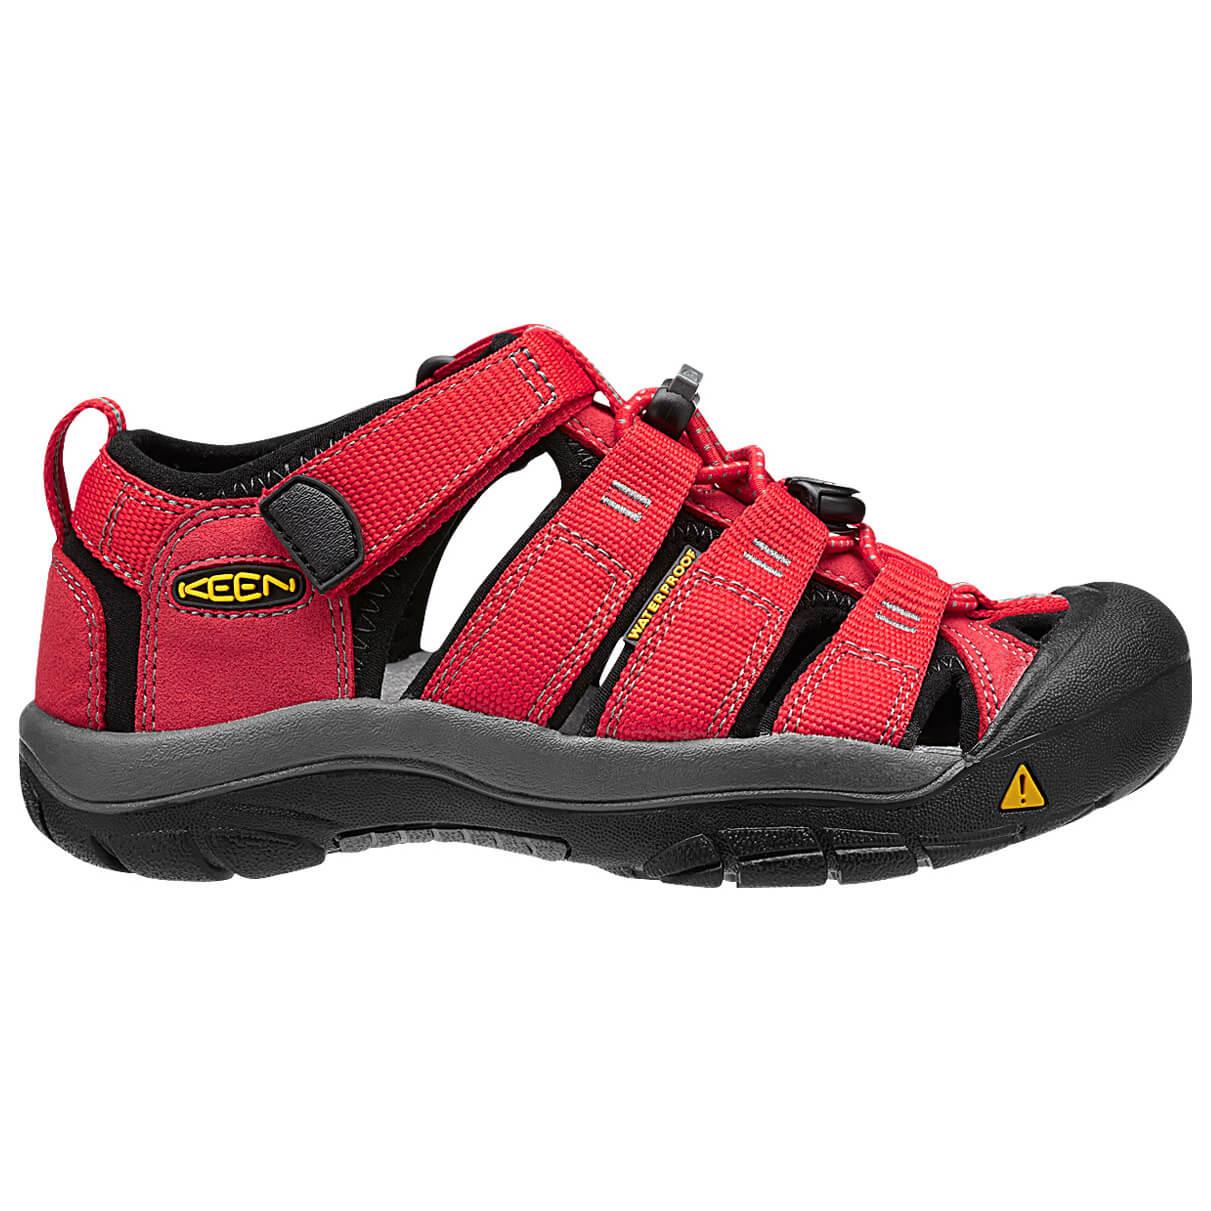 e60f914b5c3486 Keen Youth Newport H2 - Sandals Kids